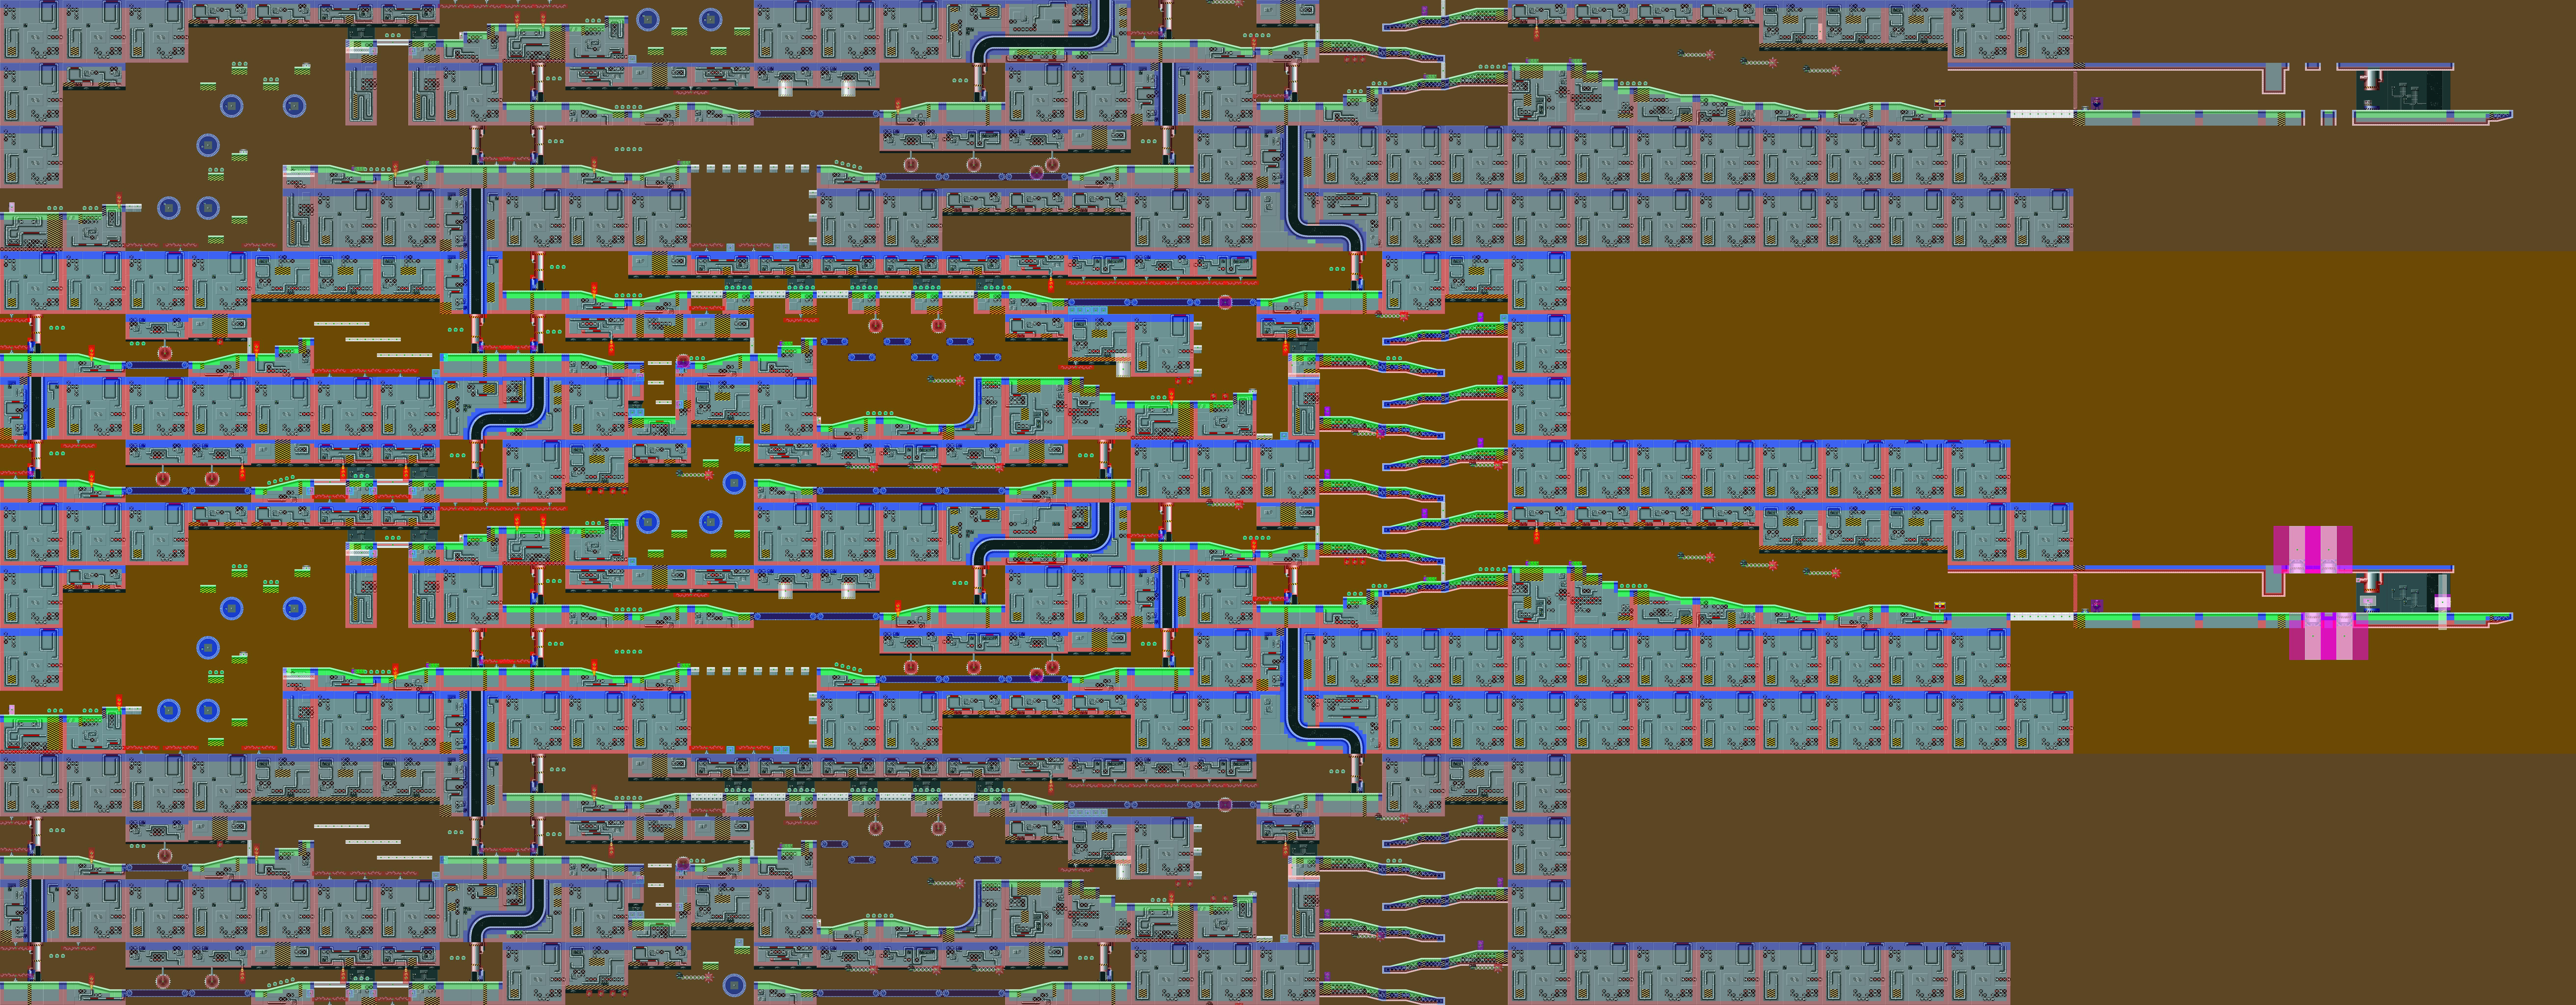 Sega Genesis Nostalgia Columns 1990